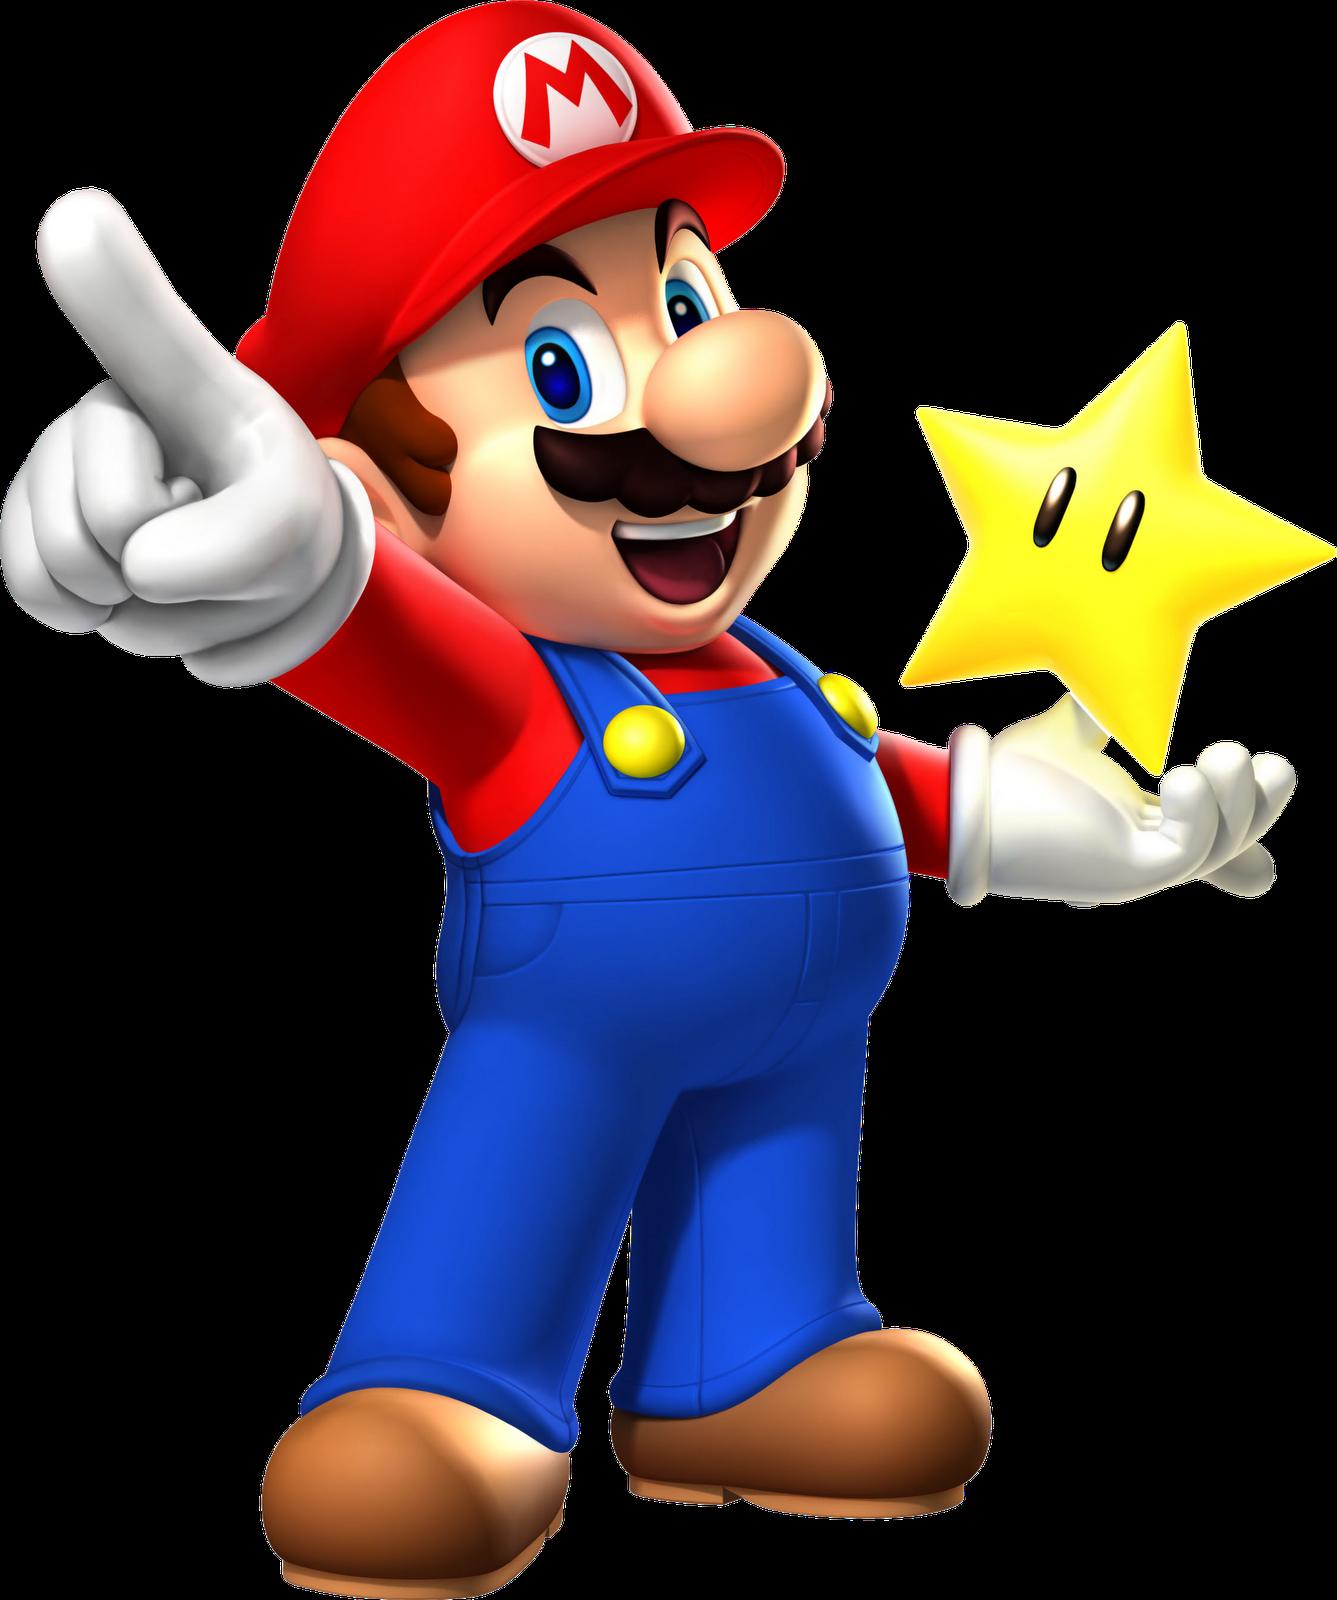 Mustache clipart mooch. Mario character giant bomb